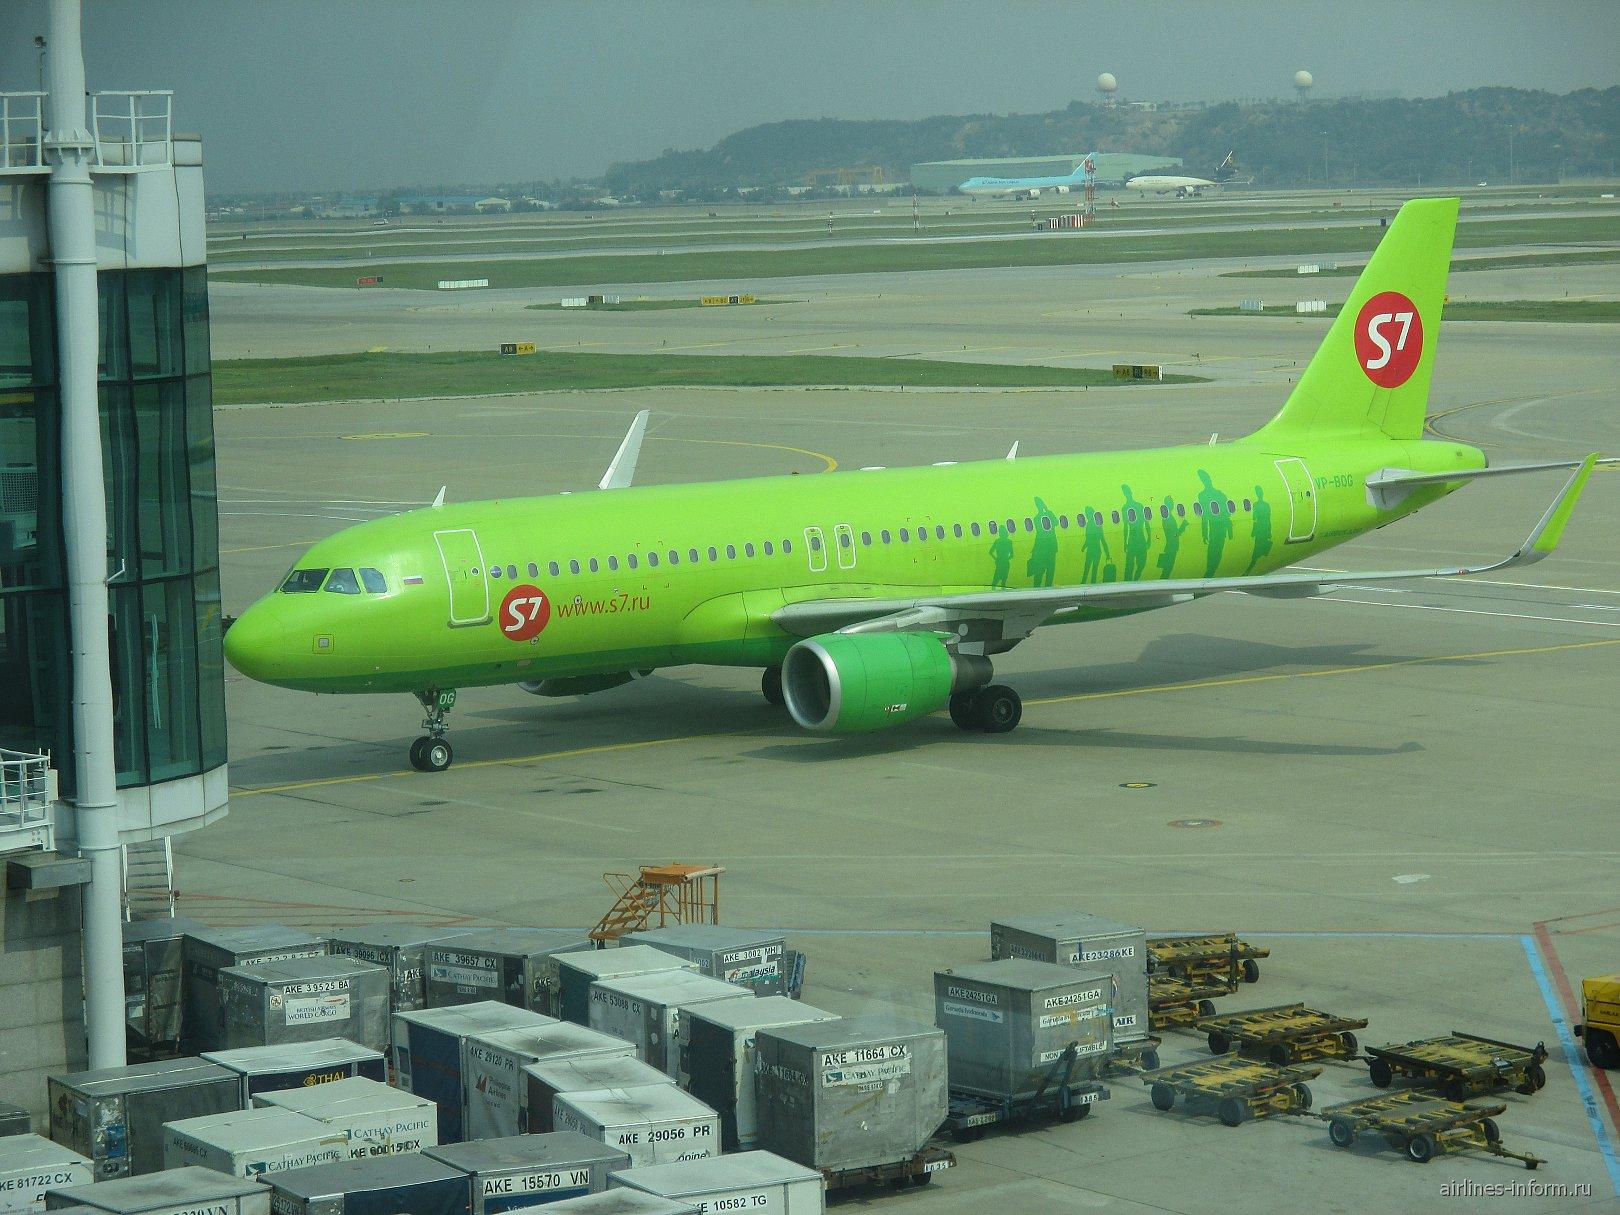 Отпуск в Корее. Часть 3 - Seoul (Incheon) - Владивосток (Кневичи) c S7 на A-320